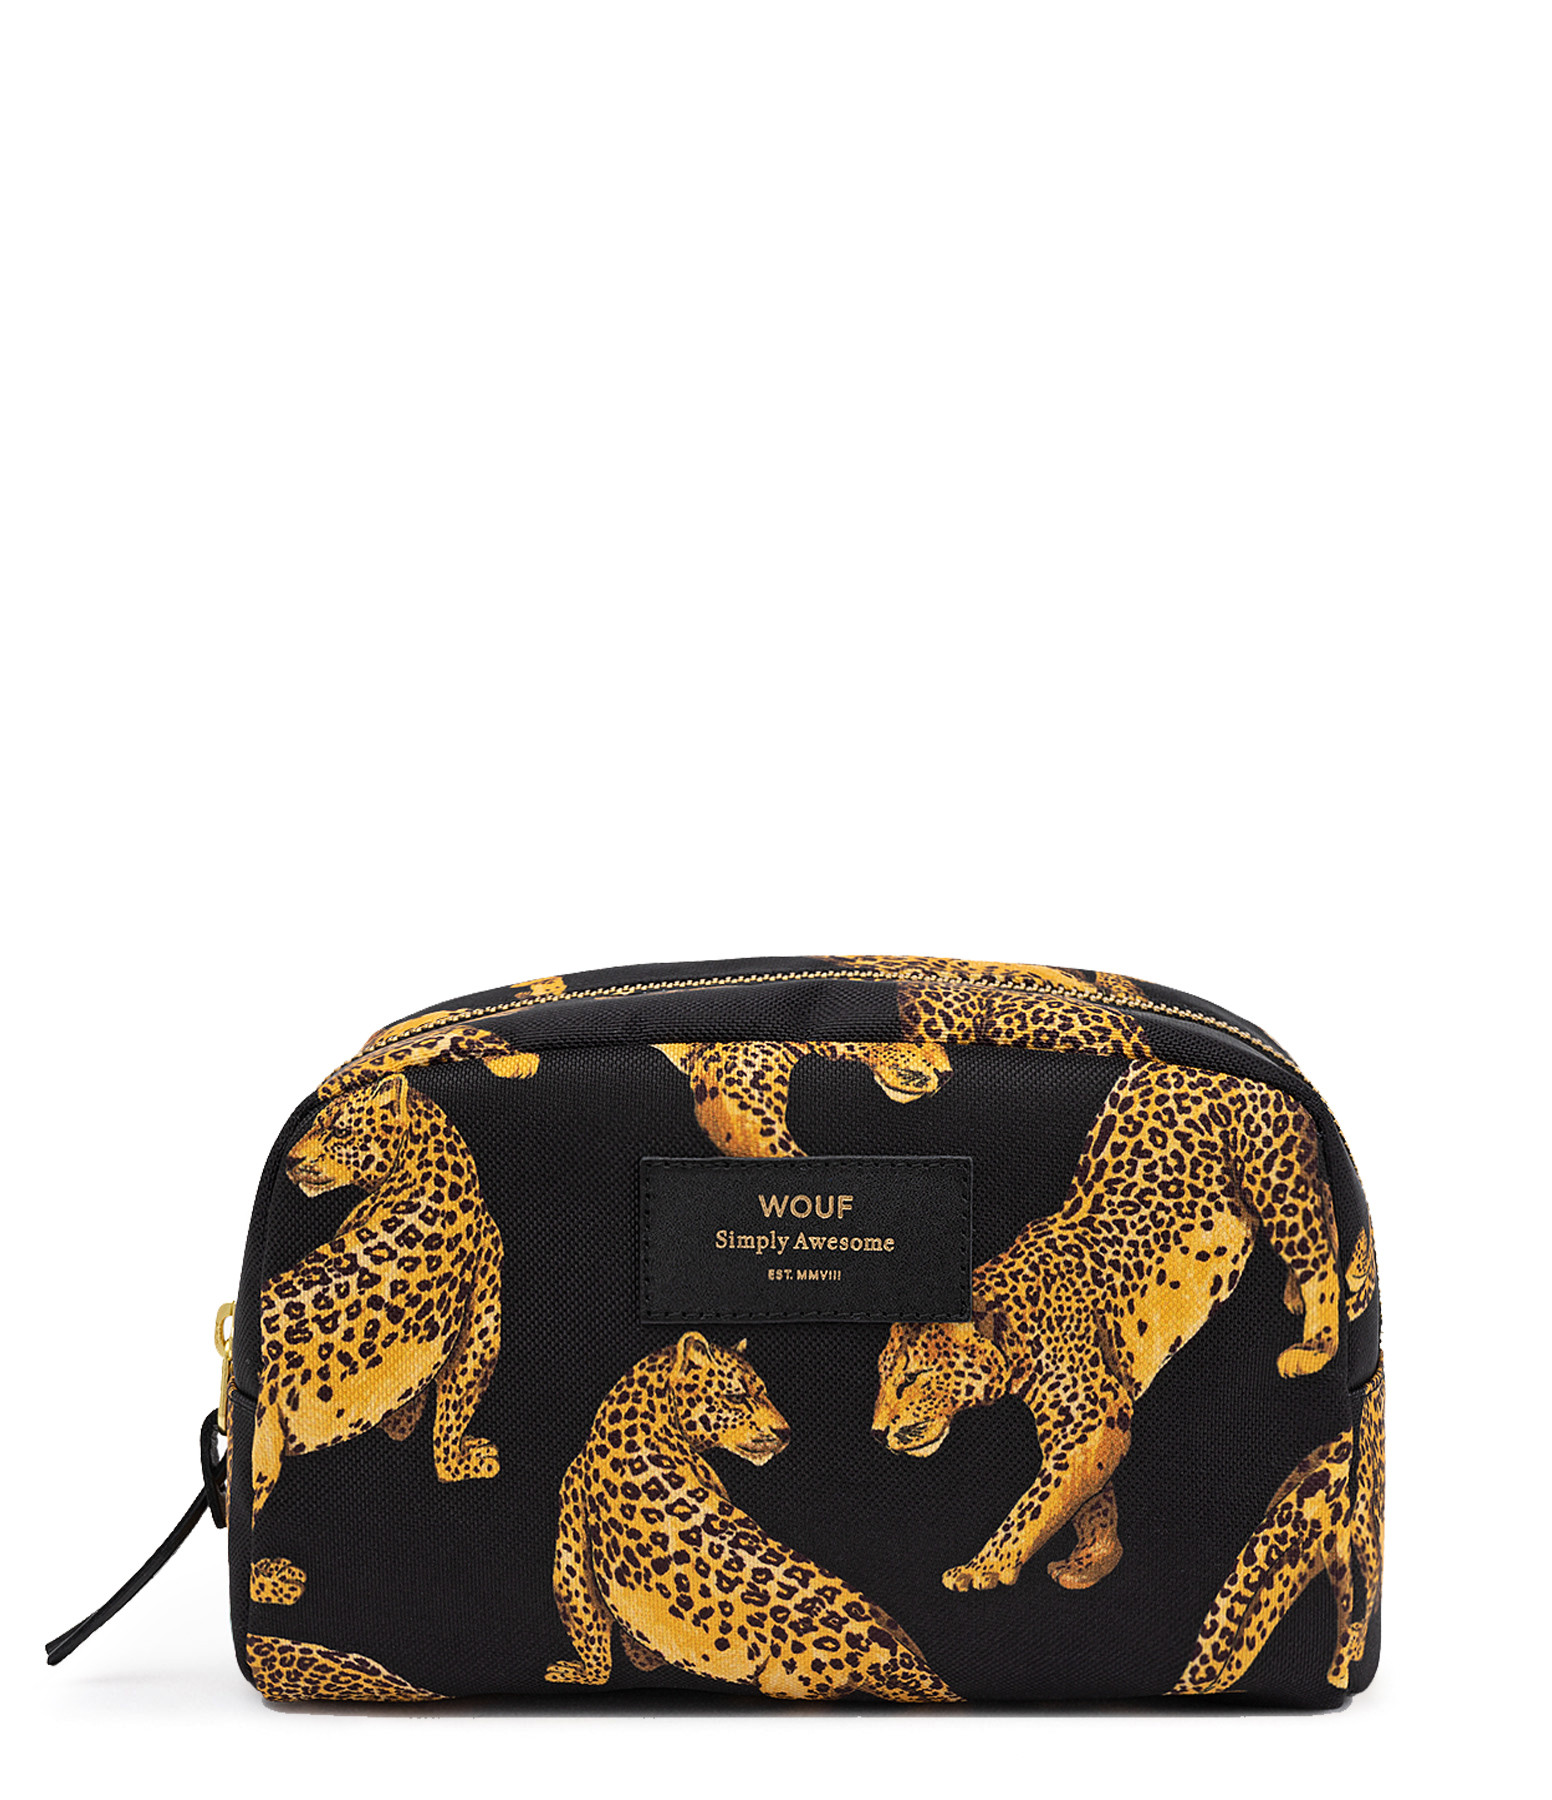 WOUF - Trousse Big Beauty Black Leopard